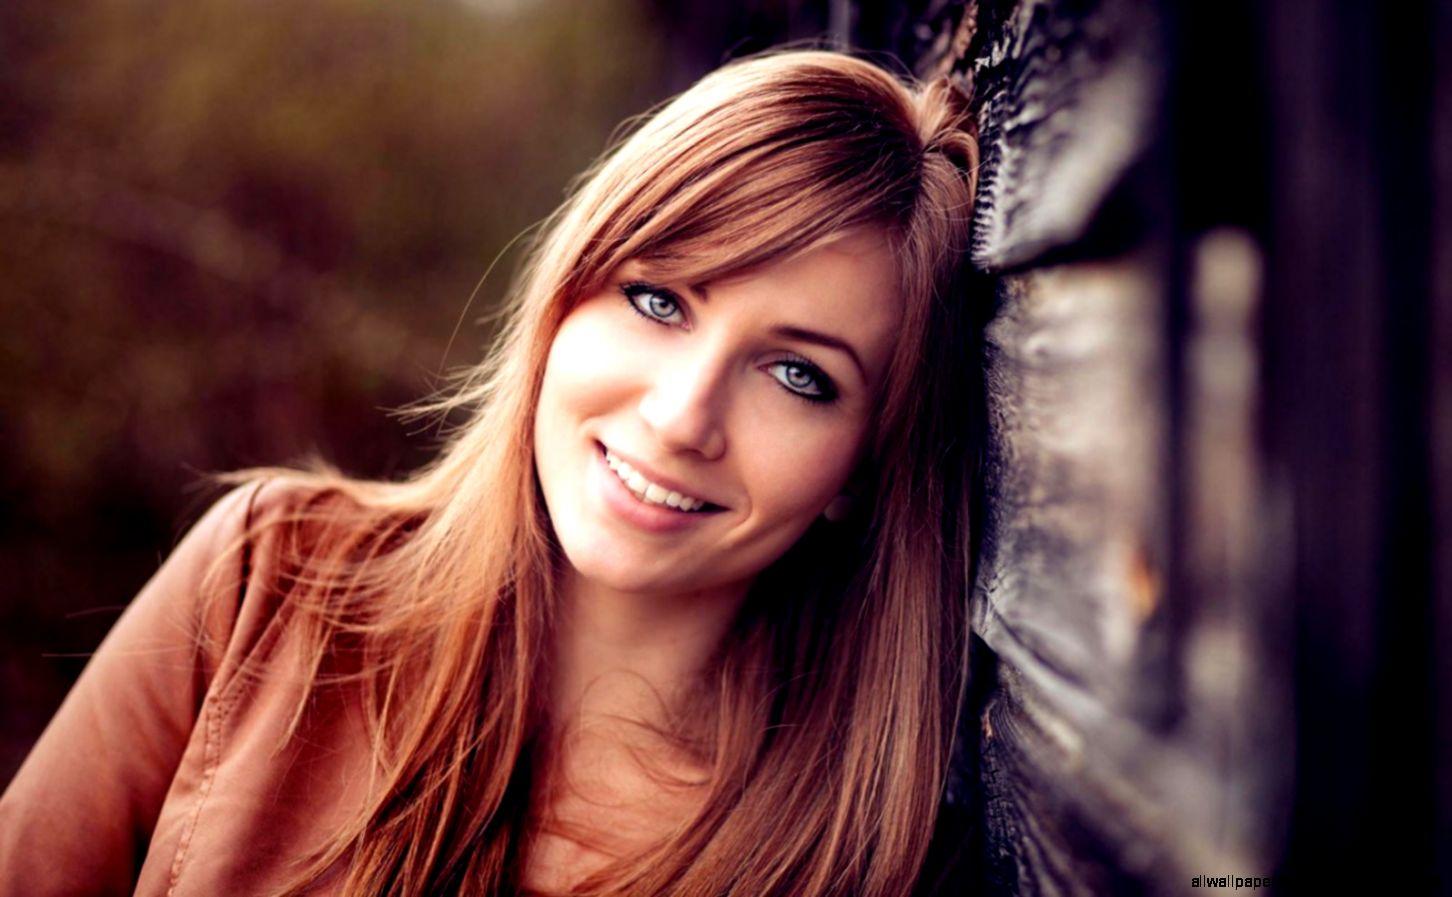 Girl Smile Bokeh Hd Wallpaper  Free High Definition Wallpapers